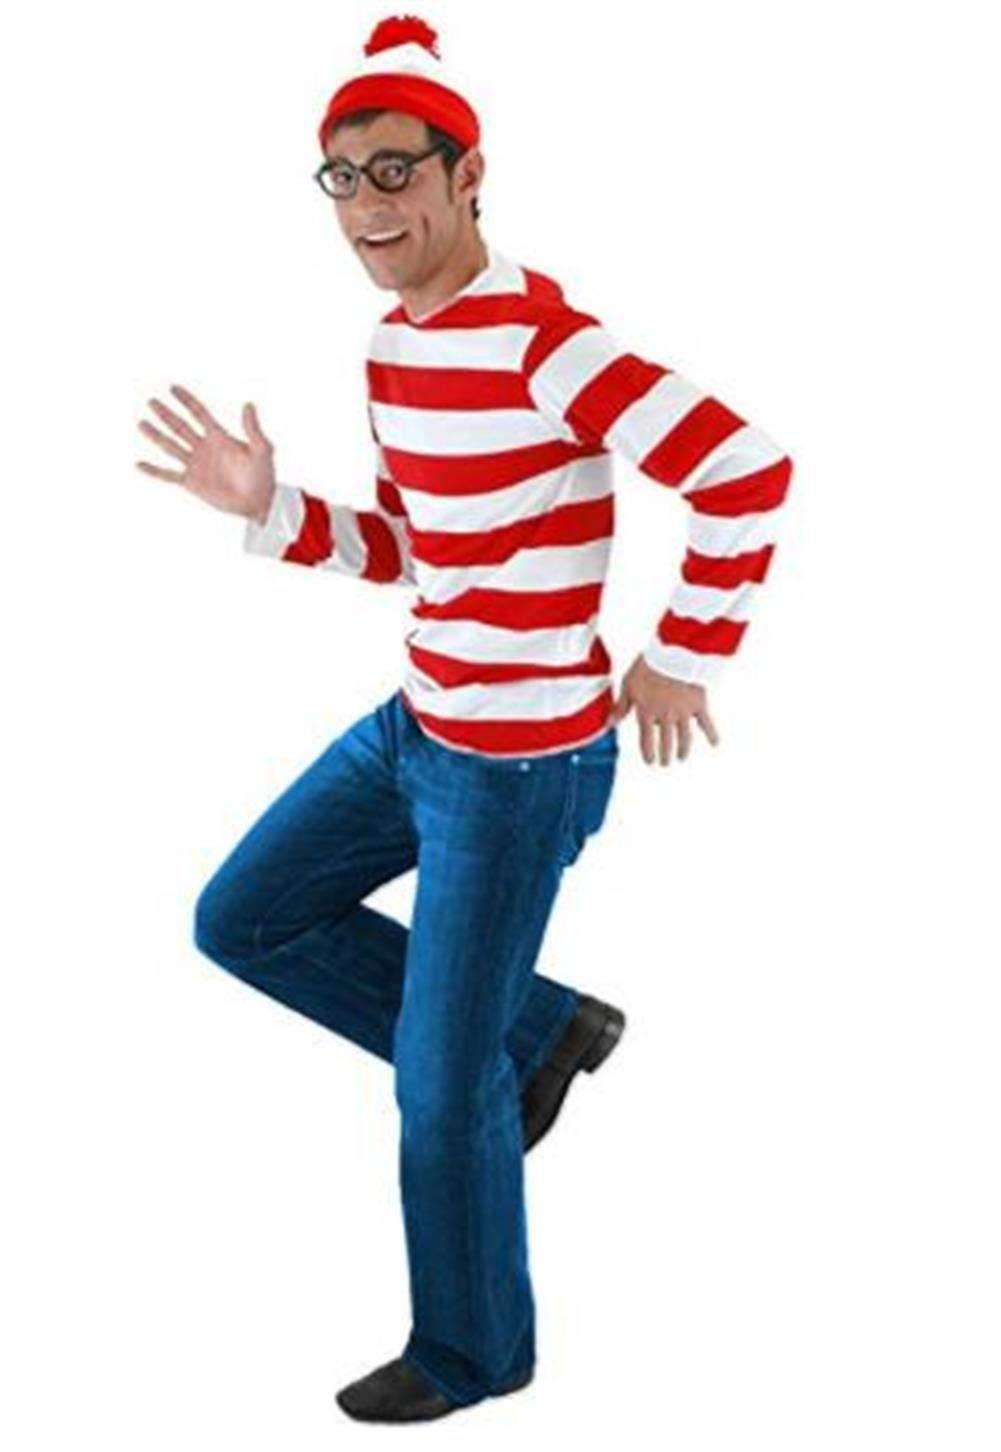 LDamcom Cosplay Where's Waldo Costume Funny Sweatshirt Hoodie Outfit Glasses Hat Cap Suits by LDamcom Cosplay